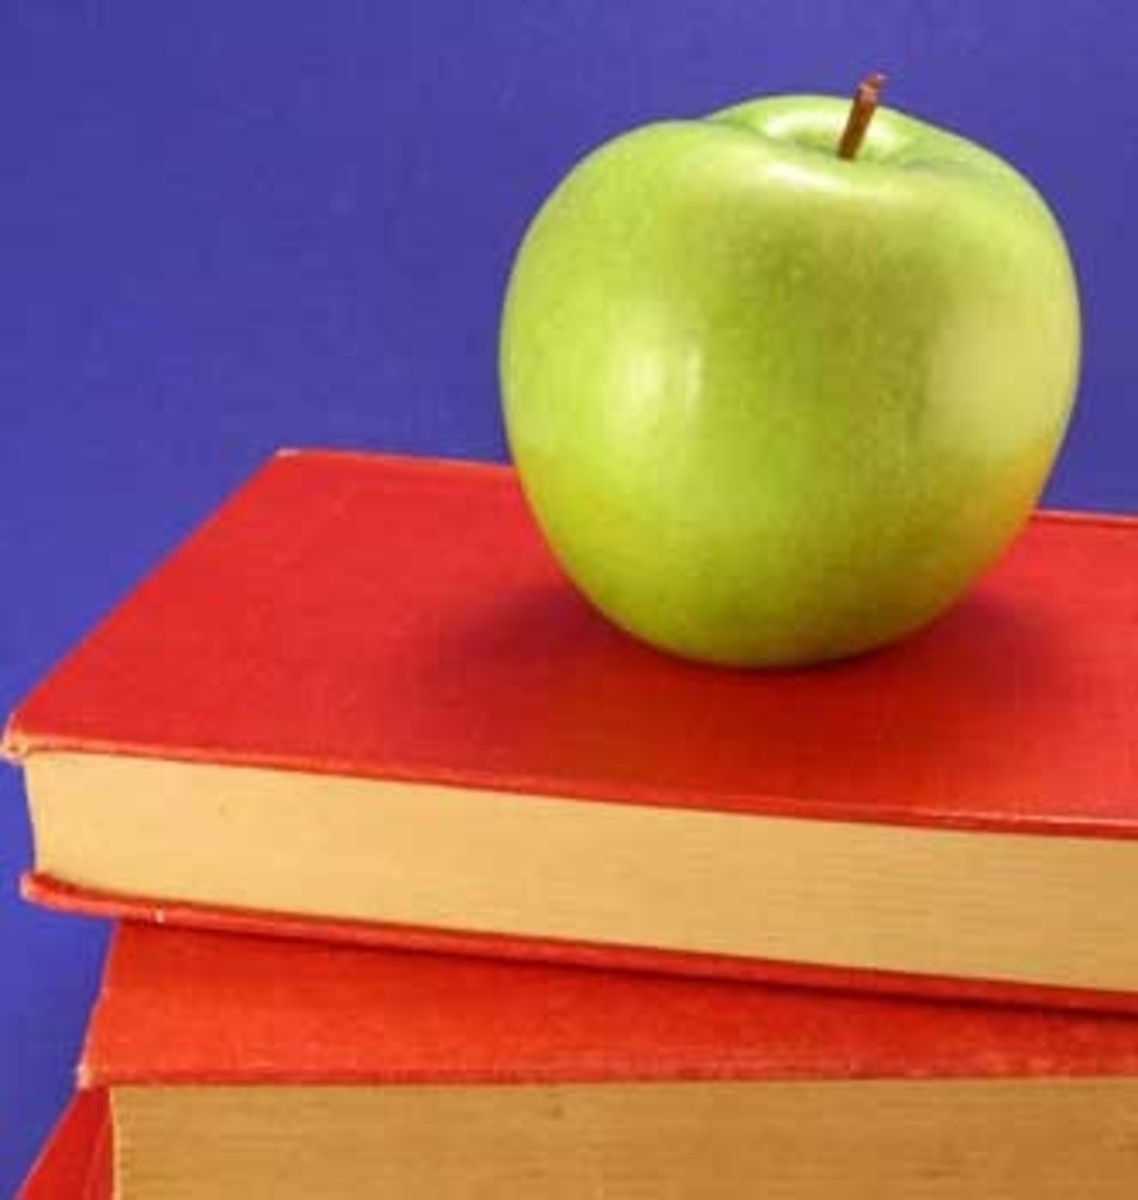 Classic classroom: apple and books